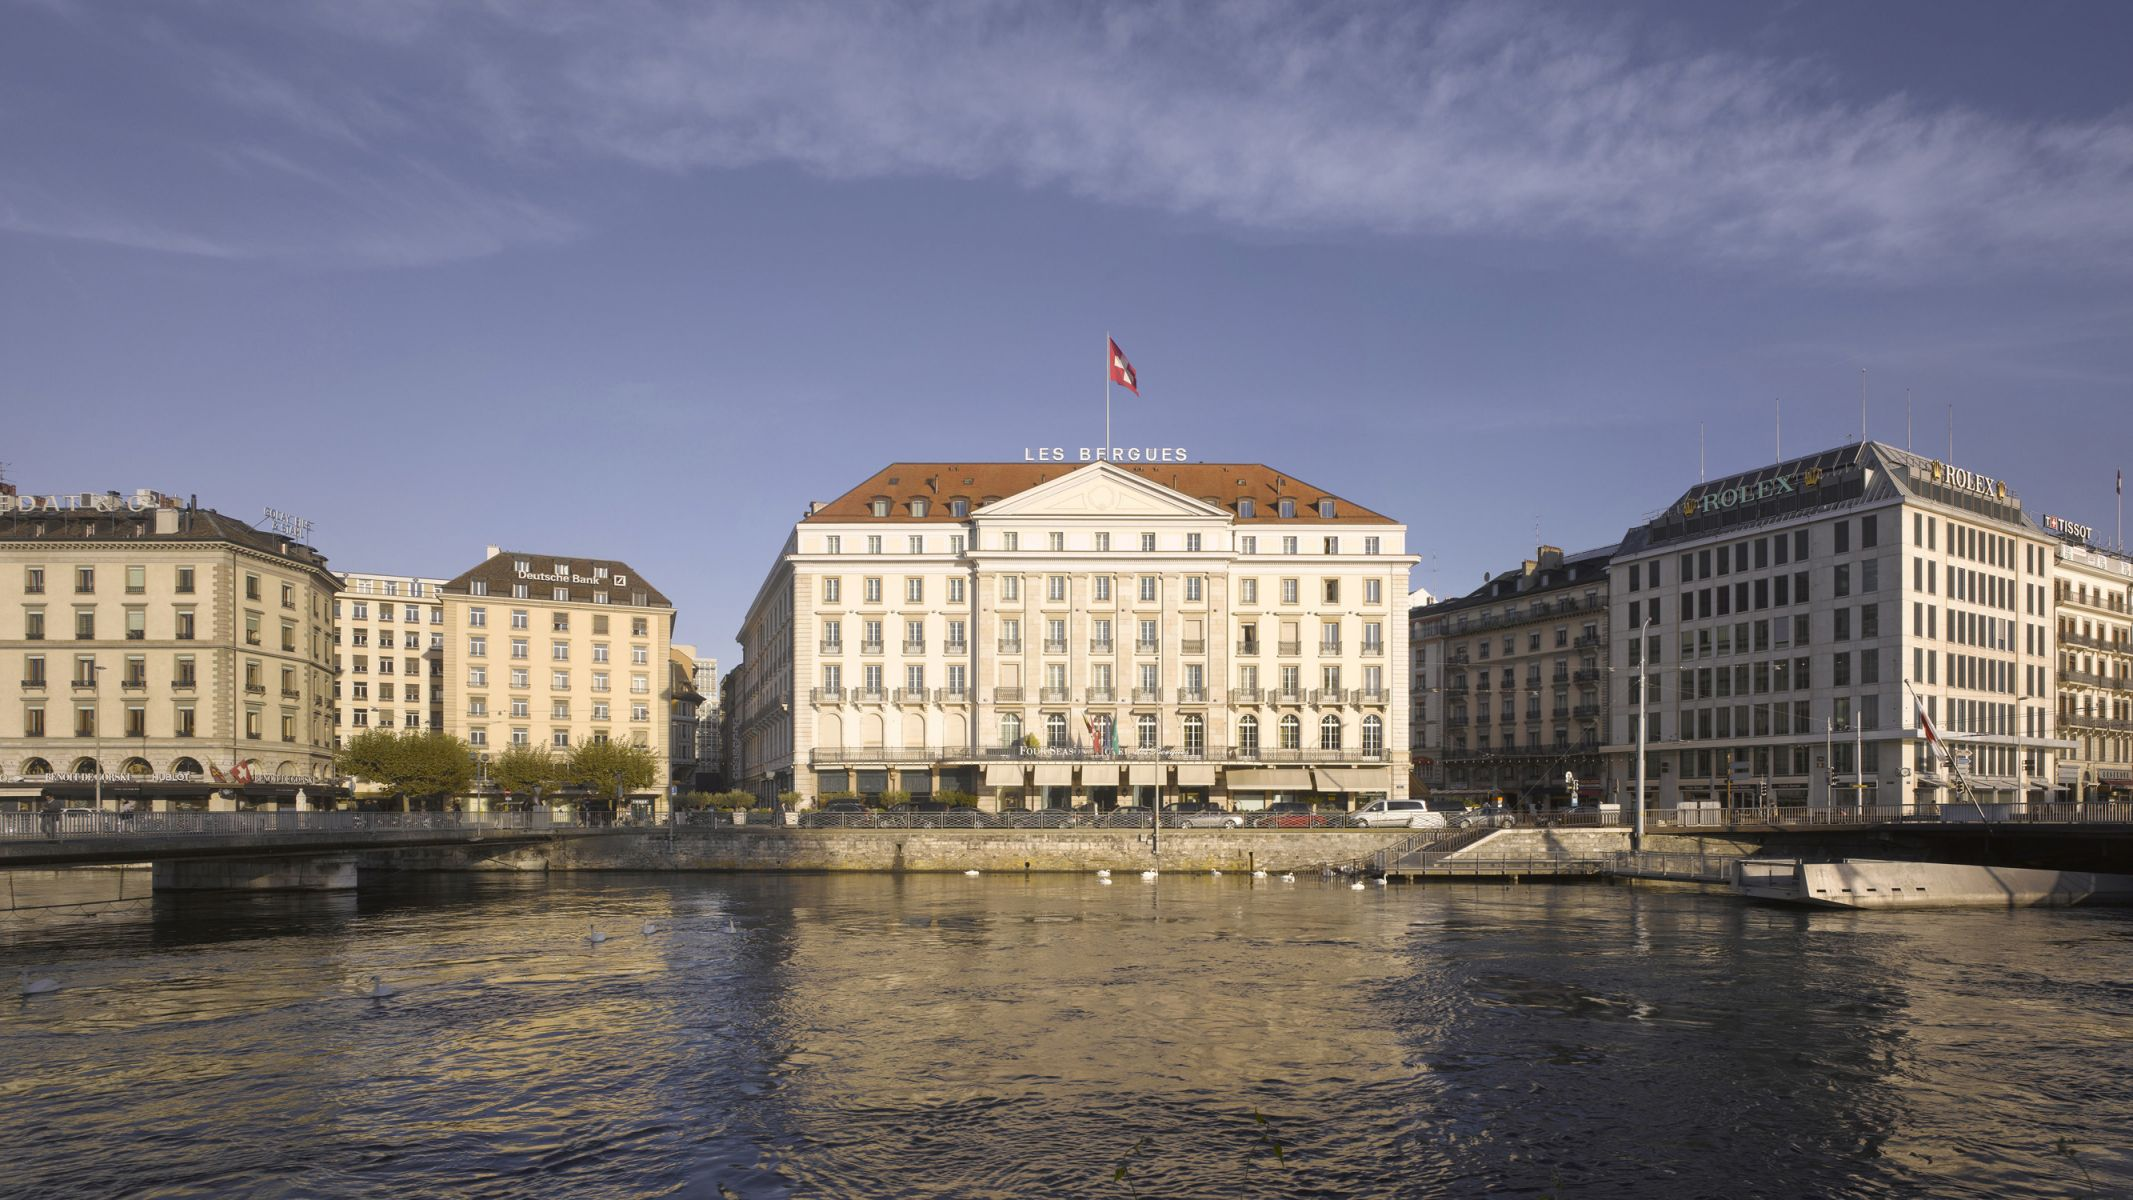 Four Seasons Hotel Des Bergues 5 Geneva Switzerland